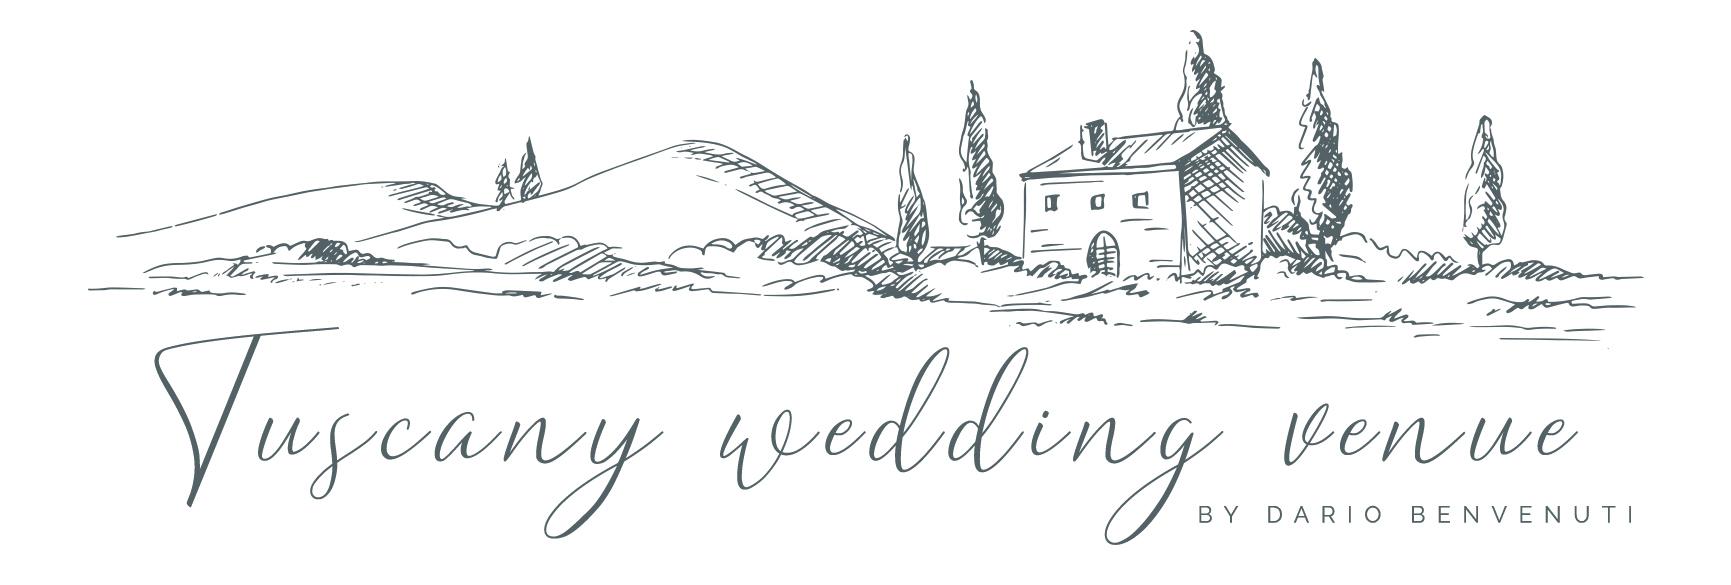 Logo Tuscany Wedding Venue